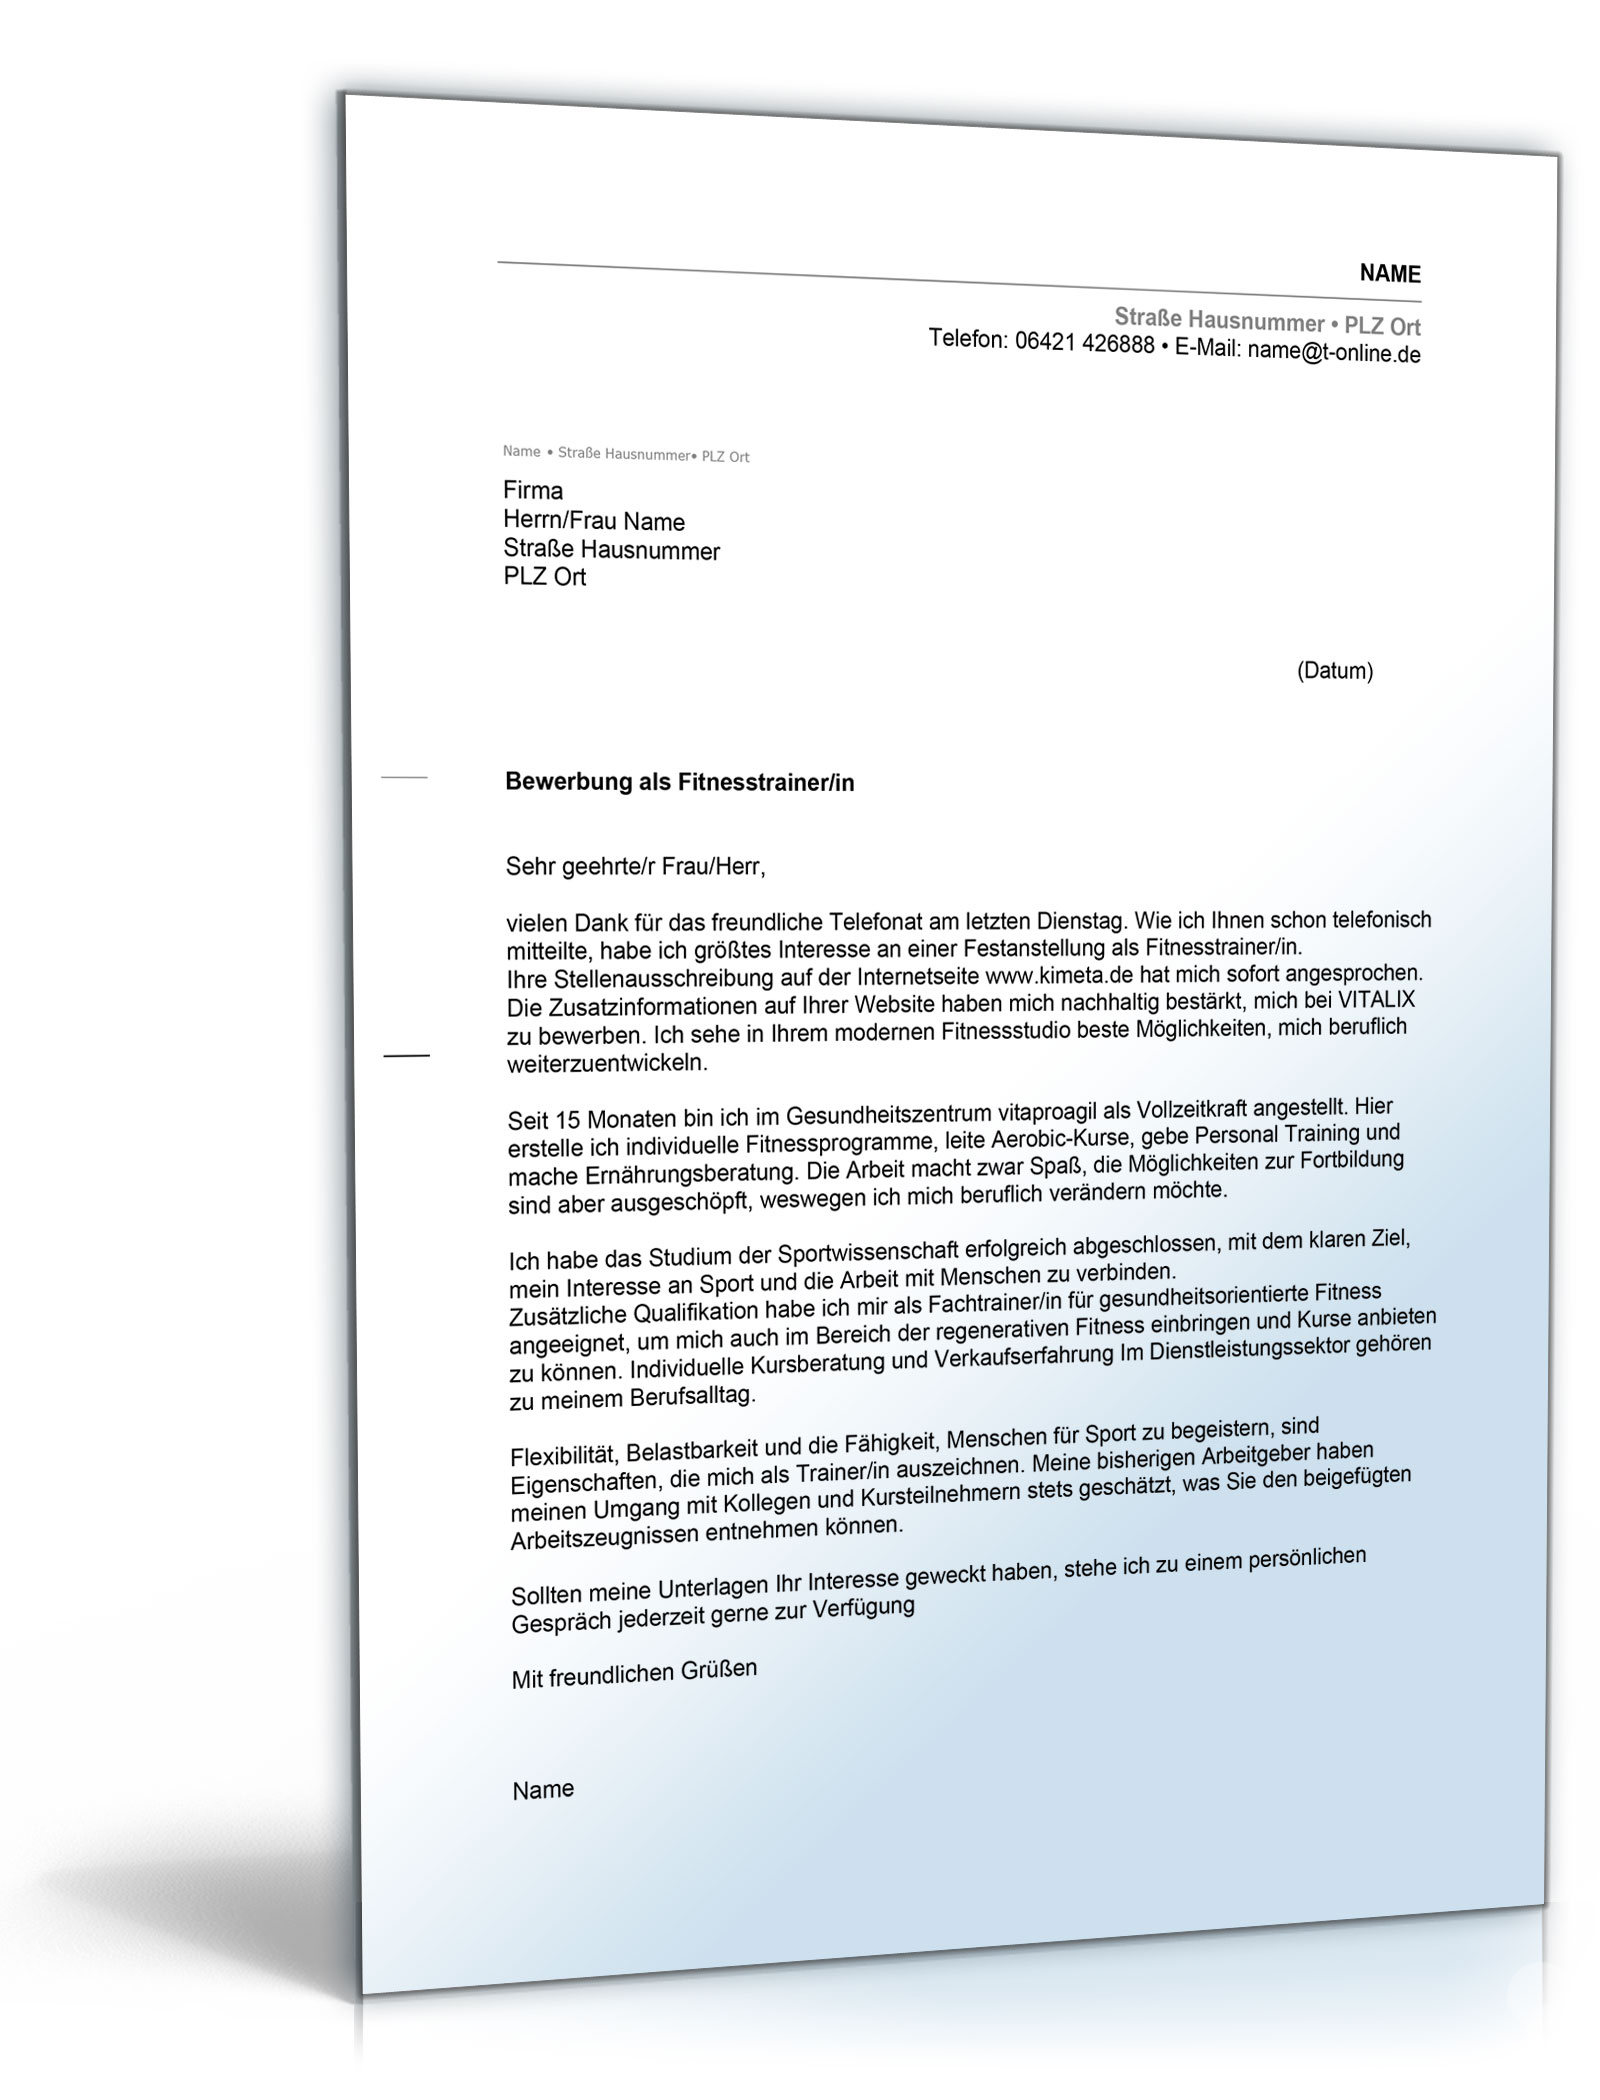 anschreiben bewerbung fitnesstrainer word dokument download amazonde software - Eigenschaften Bewerbung